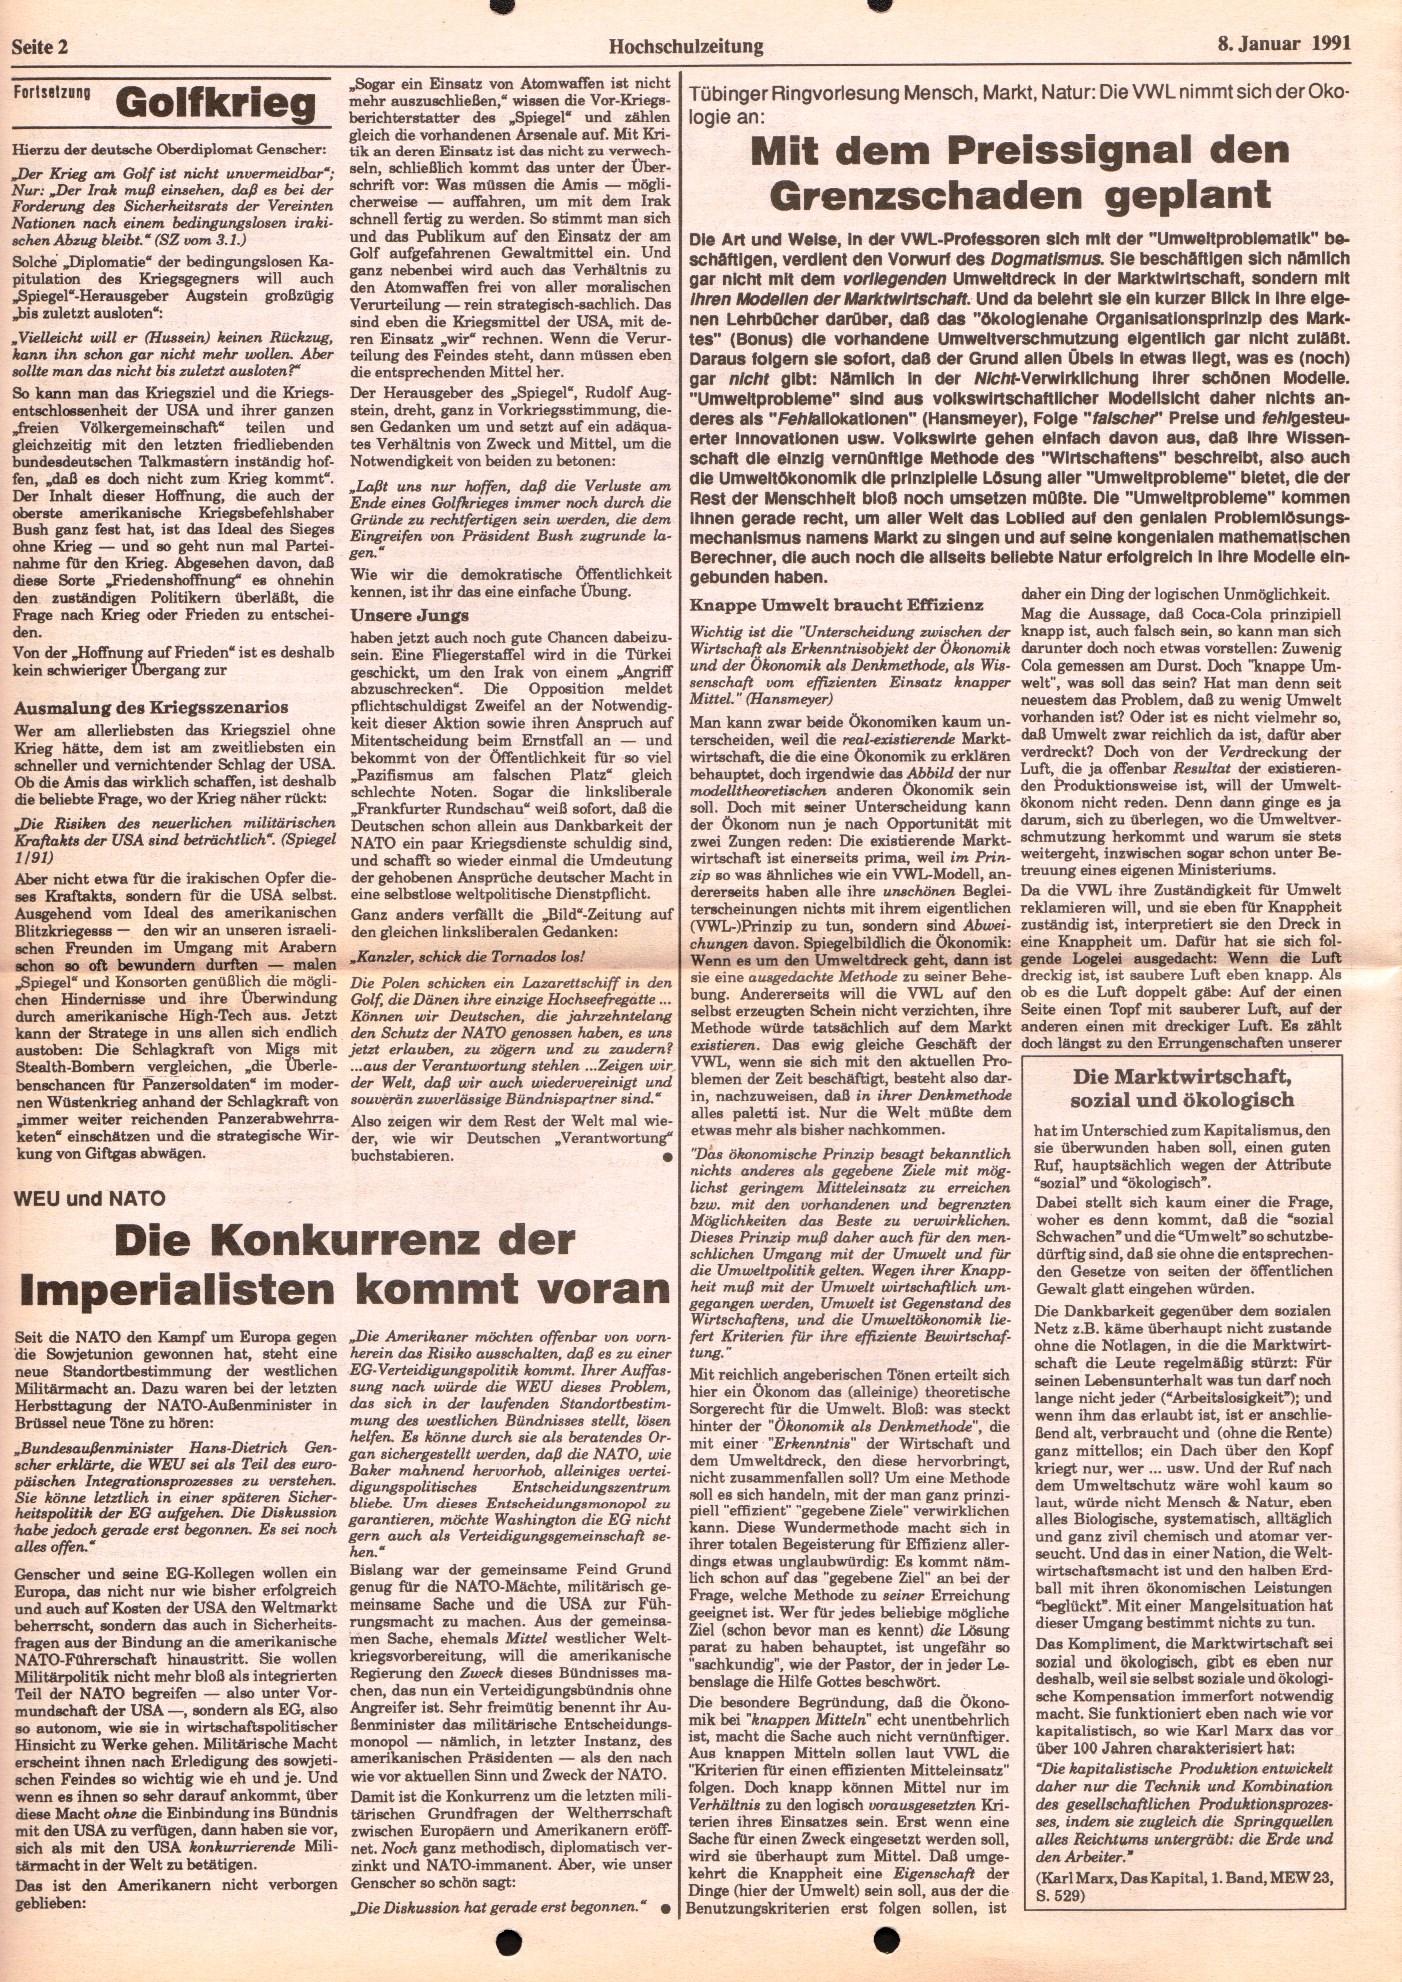 Stuttgart_MG_Hochschulzeitung_1991_01_02